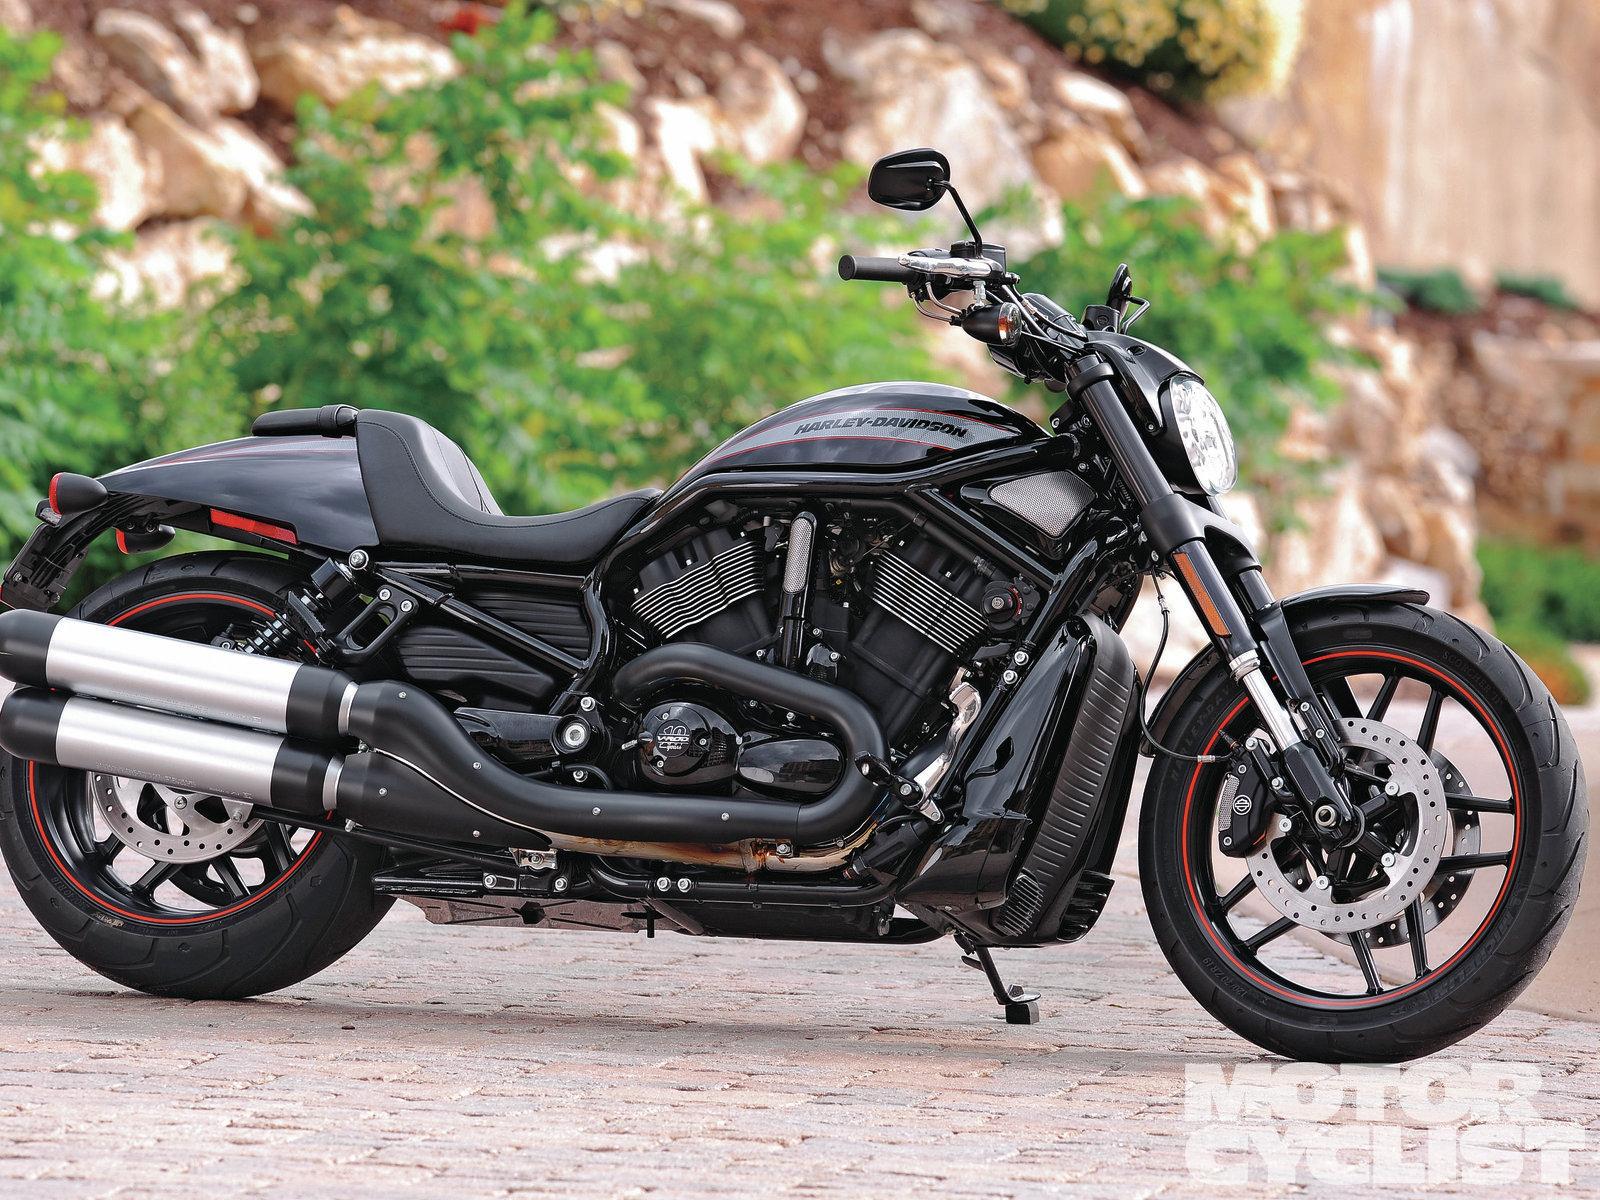 2012 Harley Davidson Night Rod Special First Ride Motorcyclist